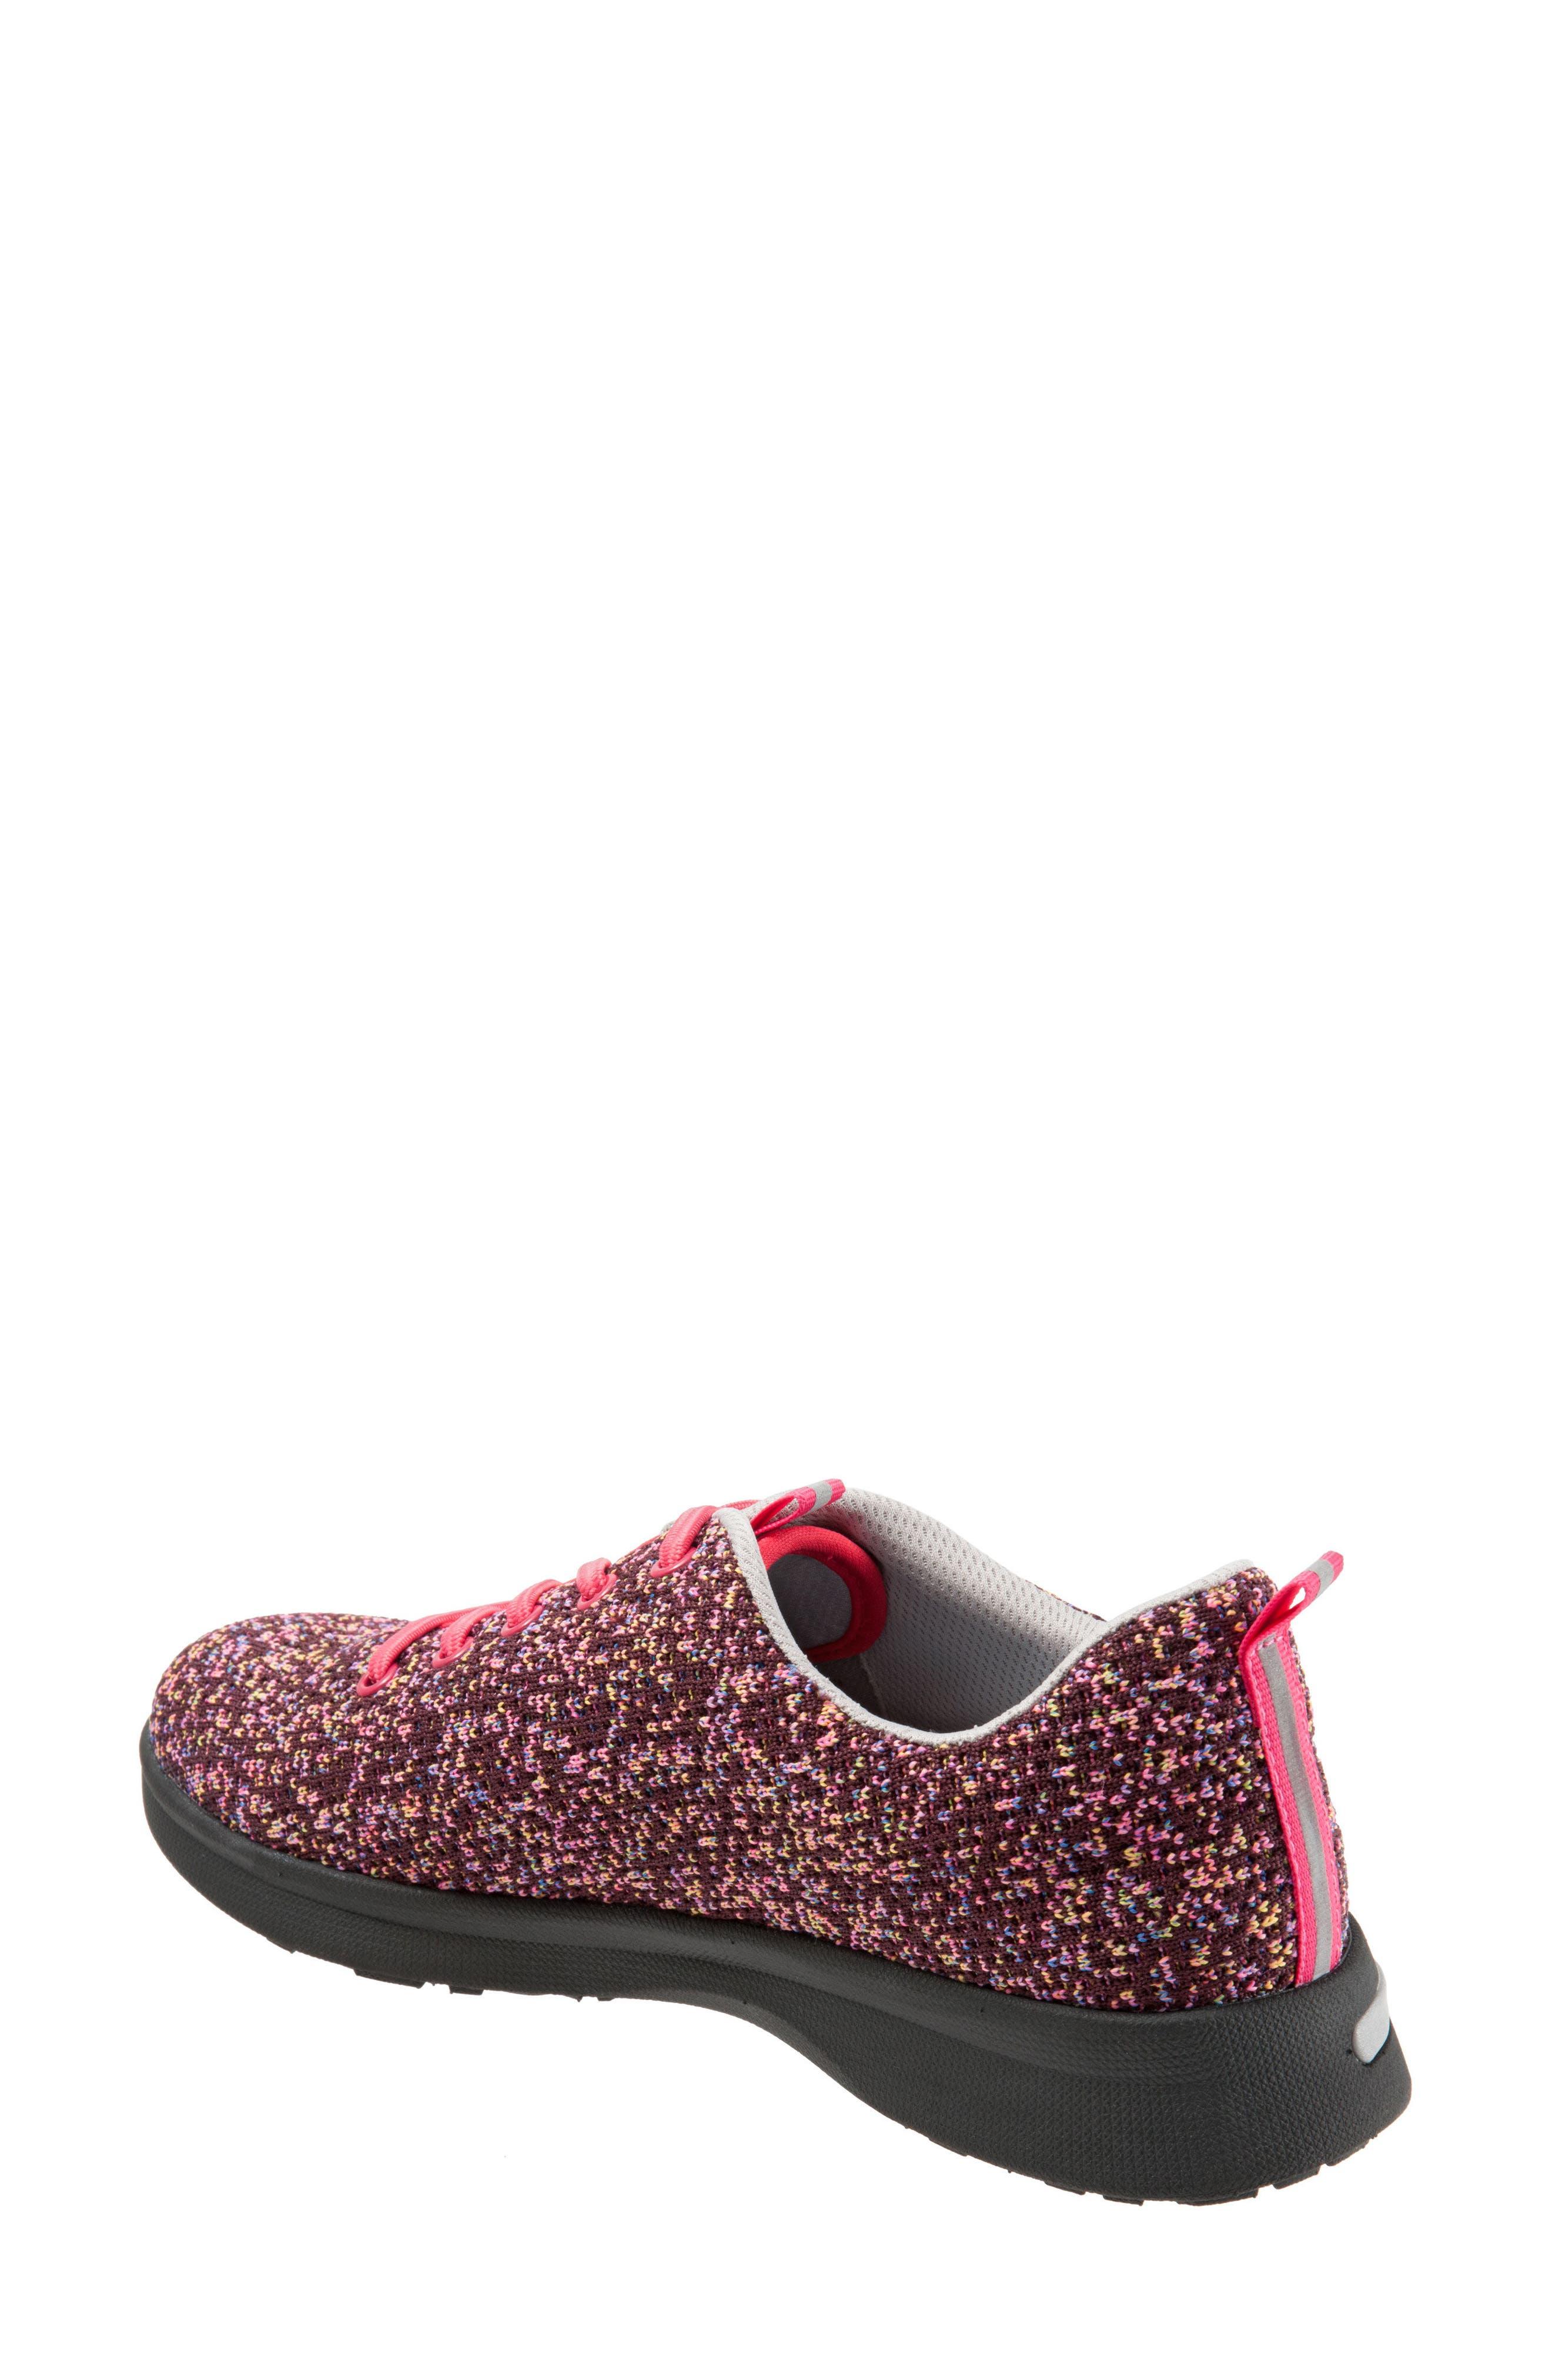 Sampson Sneaker,                             Alternate thumbnail 2, color,                             Pink Multi Fabric